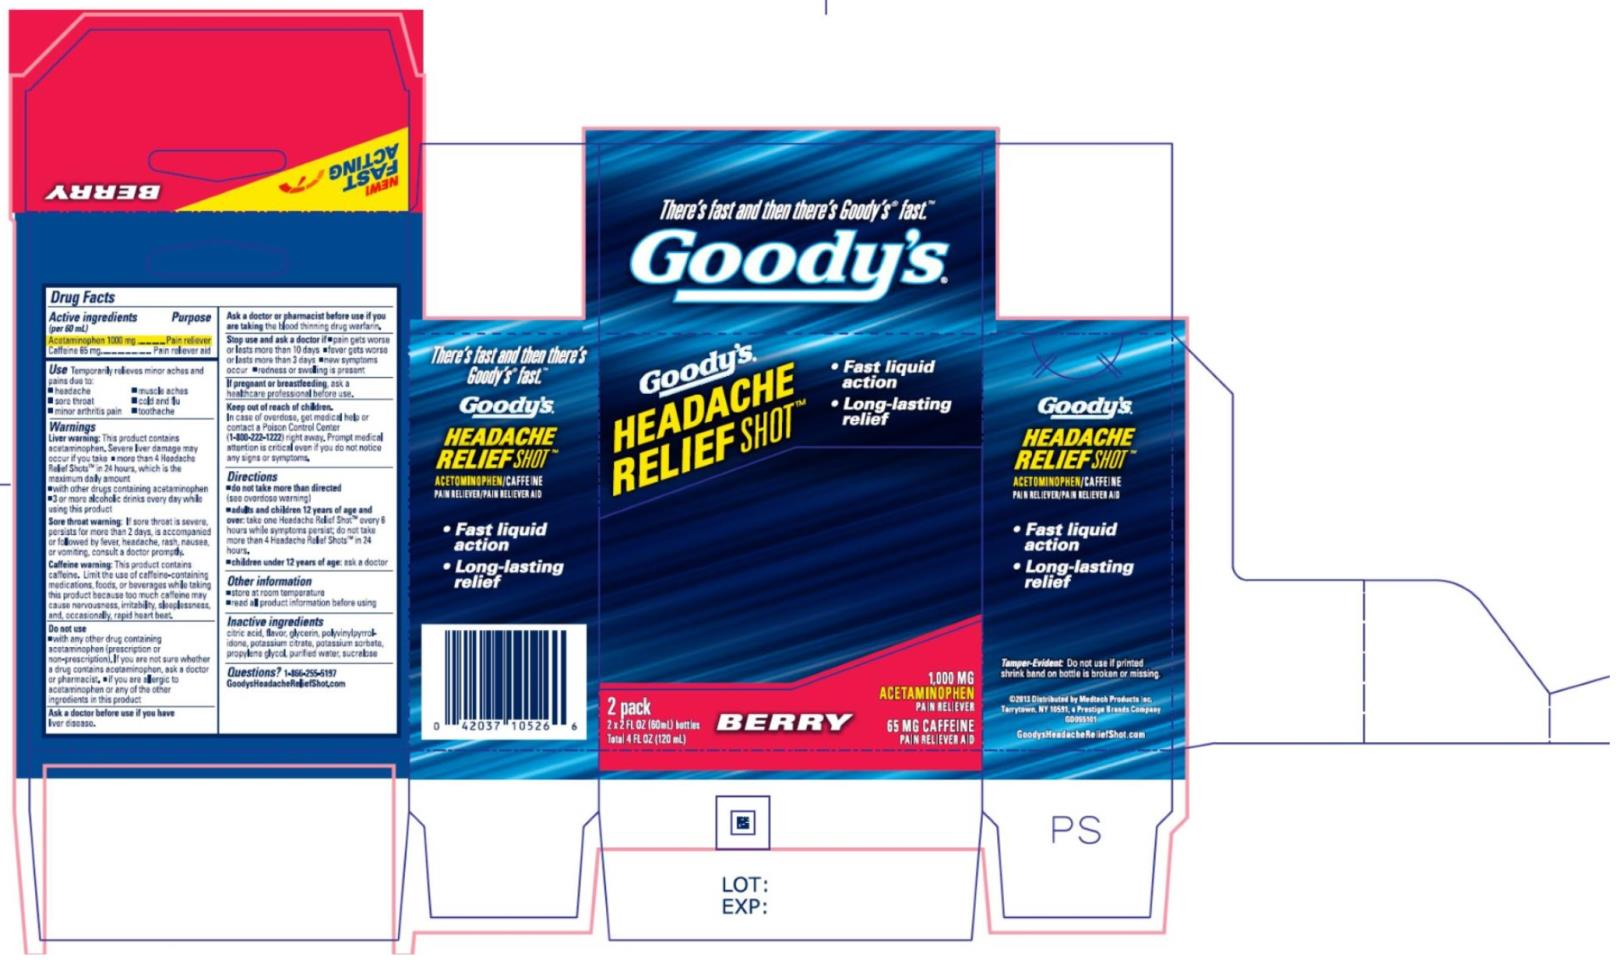 Goodys Headache Relief Shot (Acetaminophen And Caffeine) Liquid [Medtech Products Inc.]